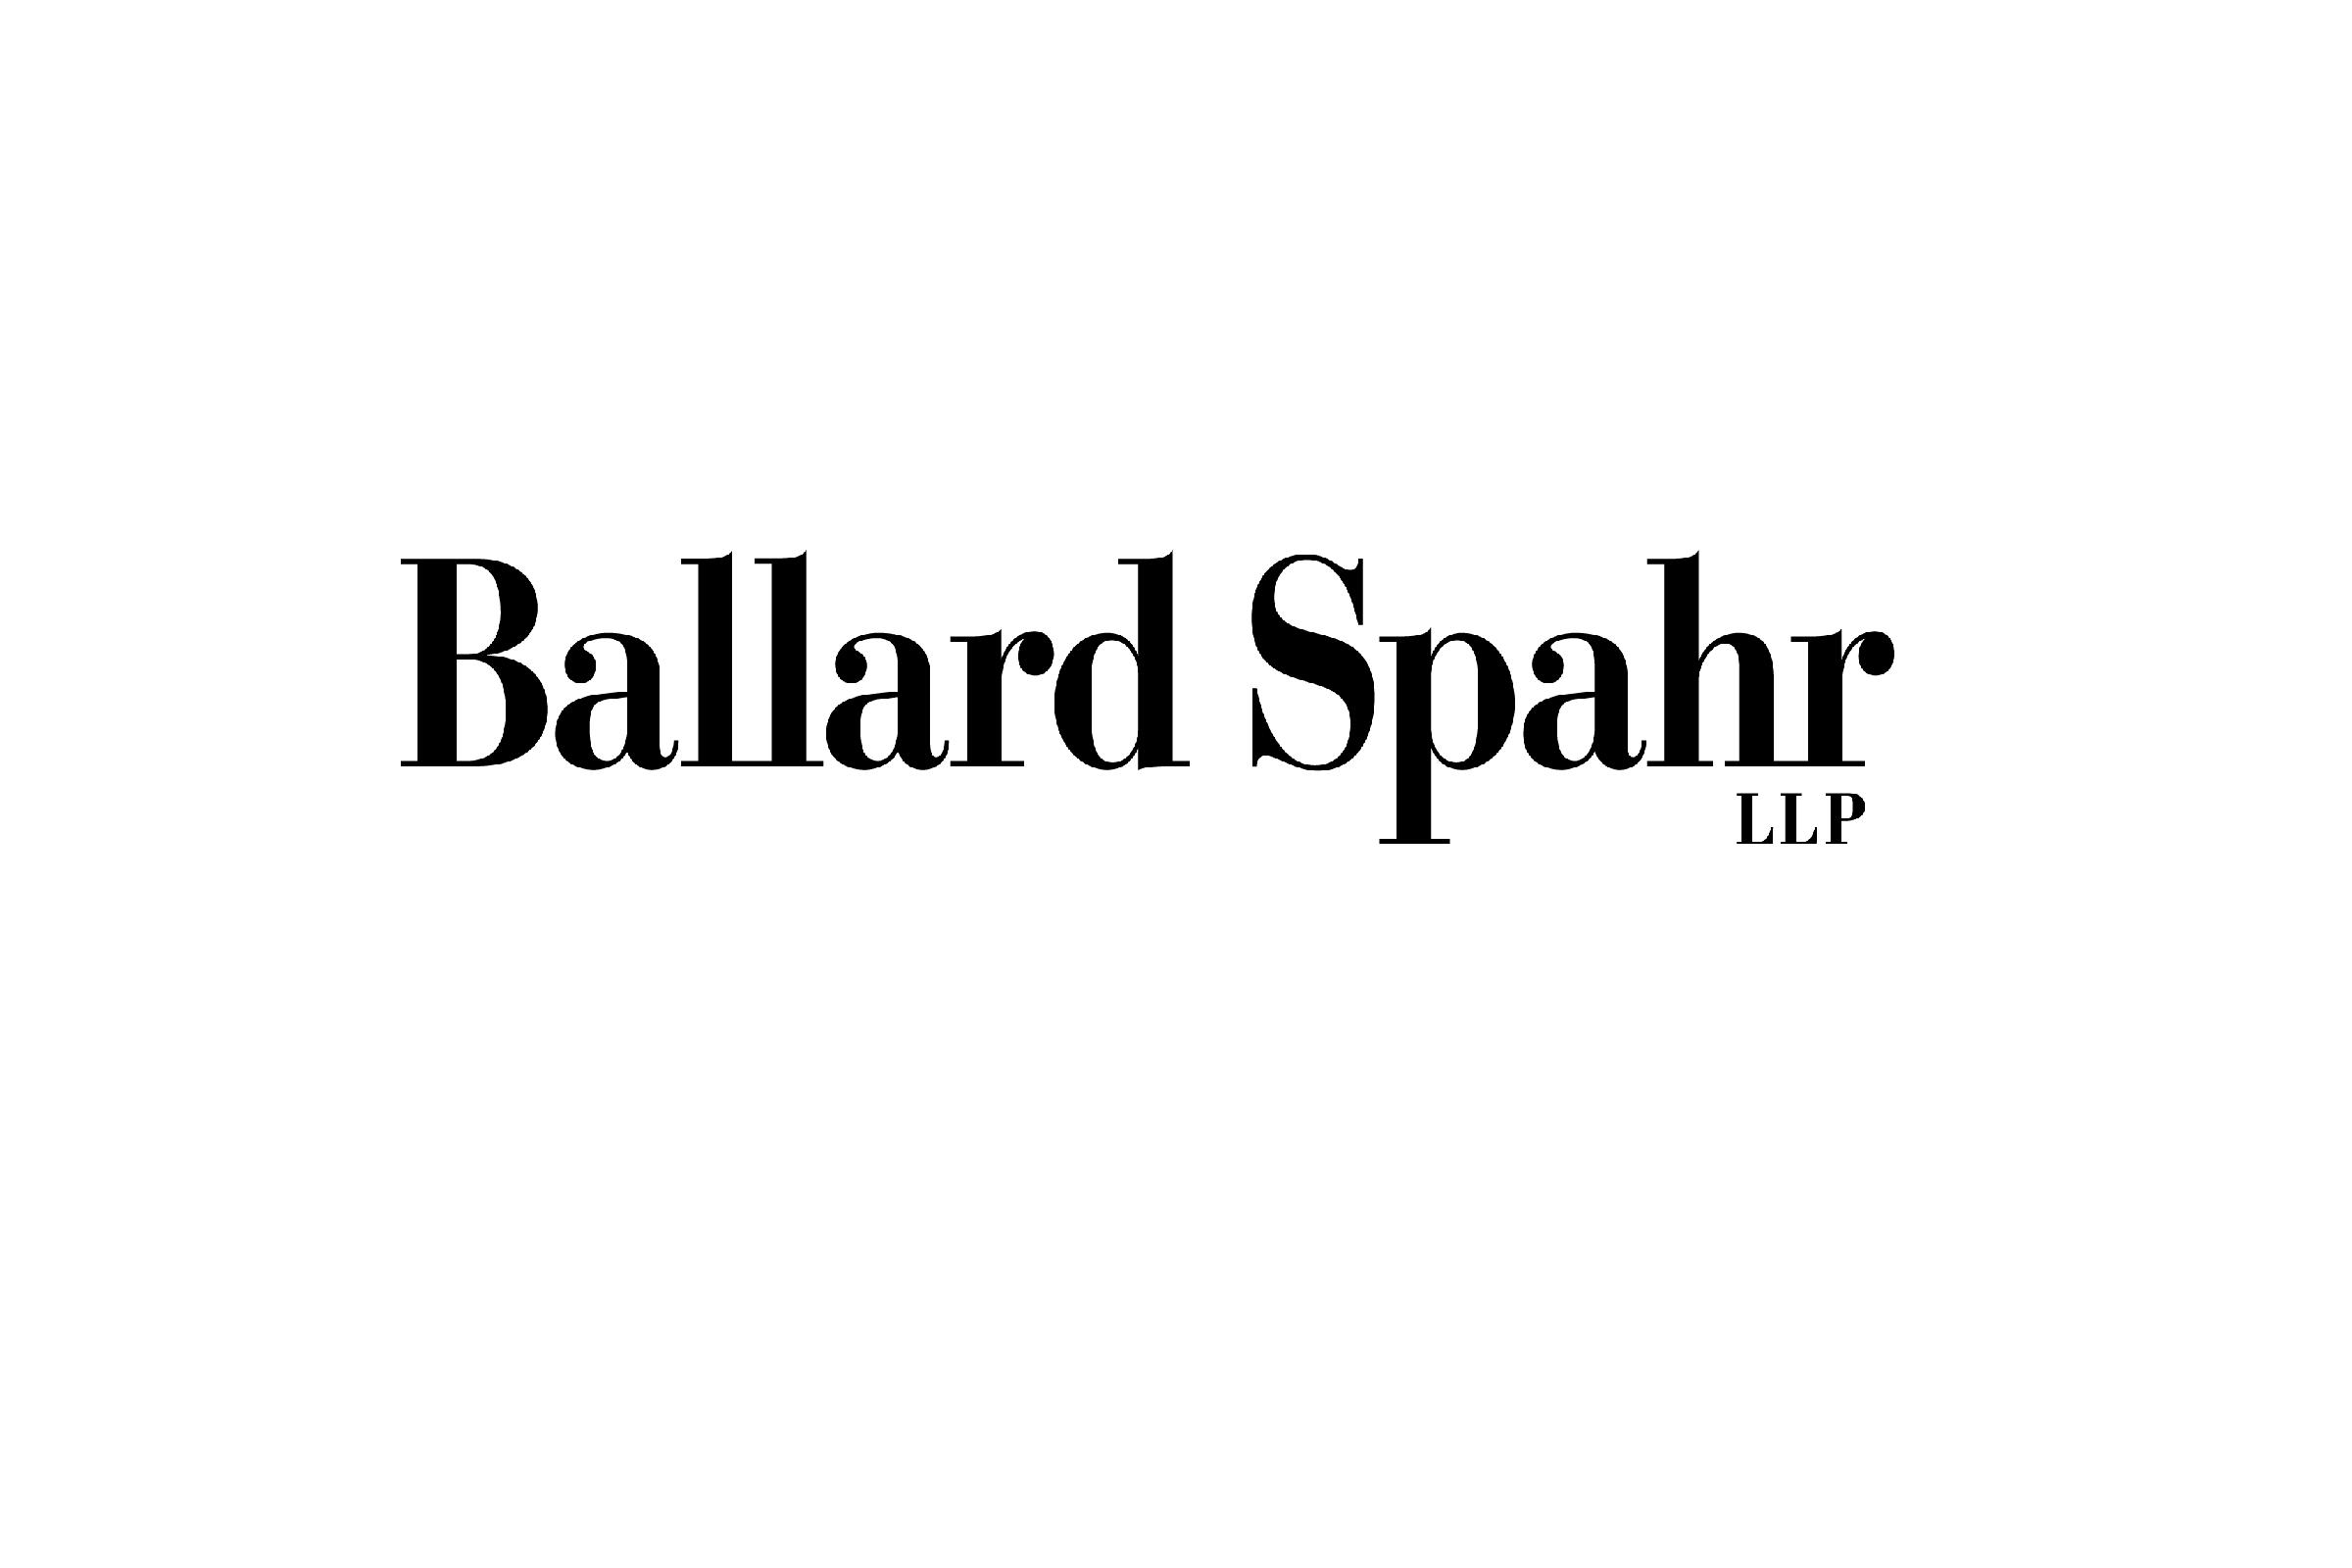 Ballard Spahr Risk Management of Third Party/Service Provider Relationships